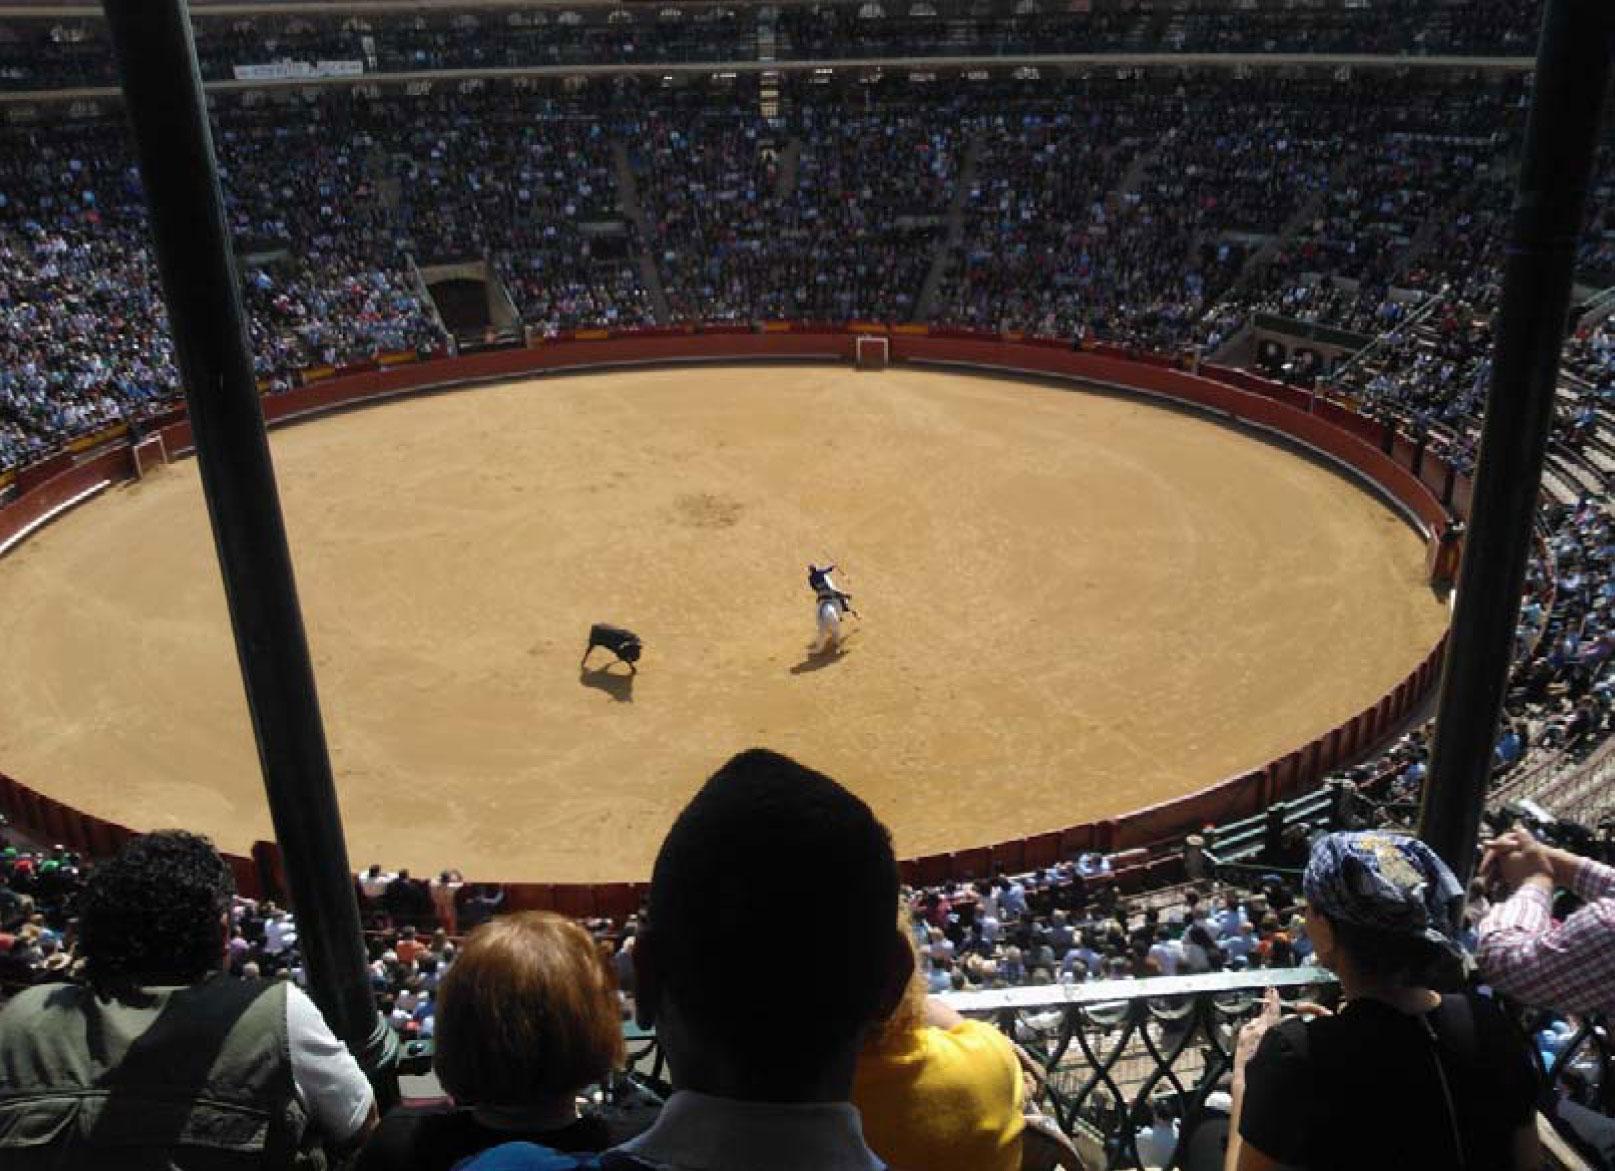 Stierkampf zu Pferd (rejoneo)